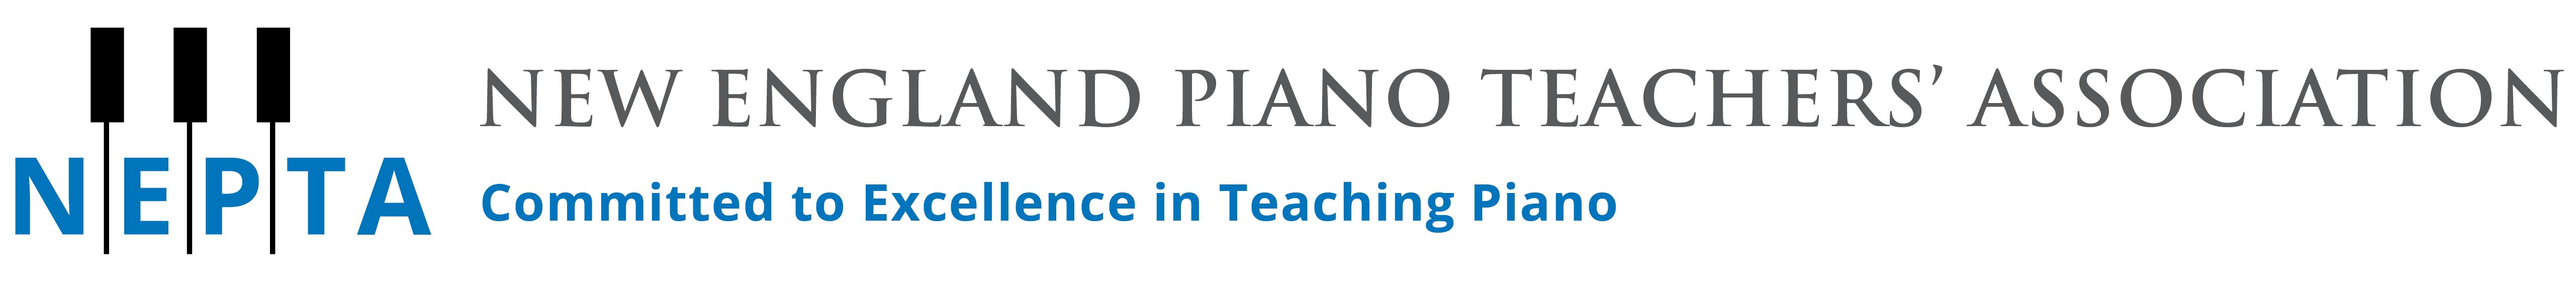 New England Piano Teachers